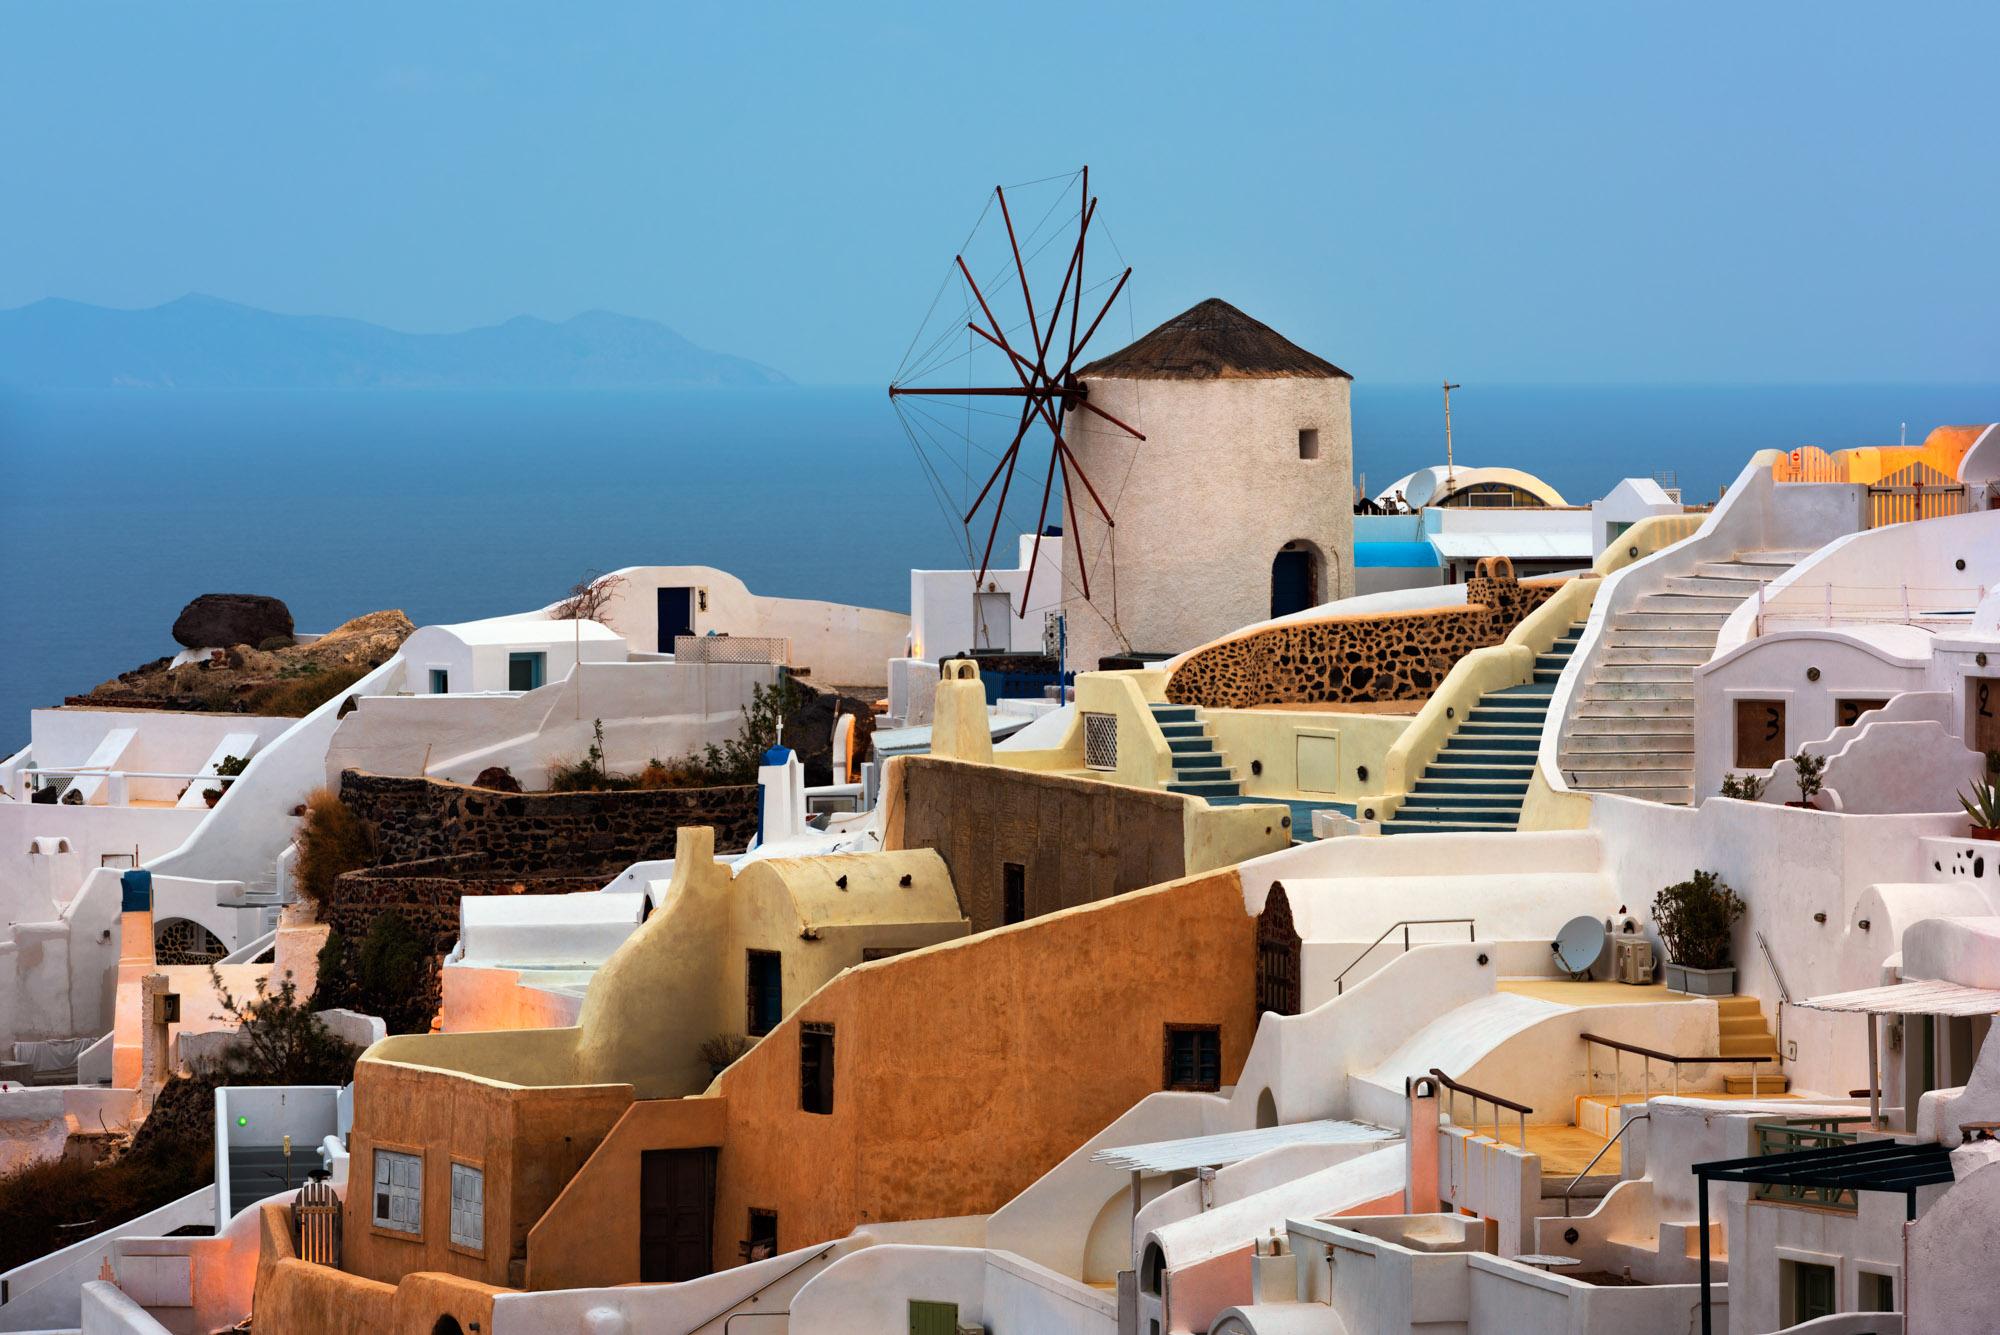 Windmills of Oia Village, Dawn, Santorini, Greece